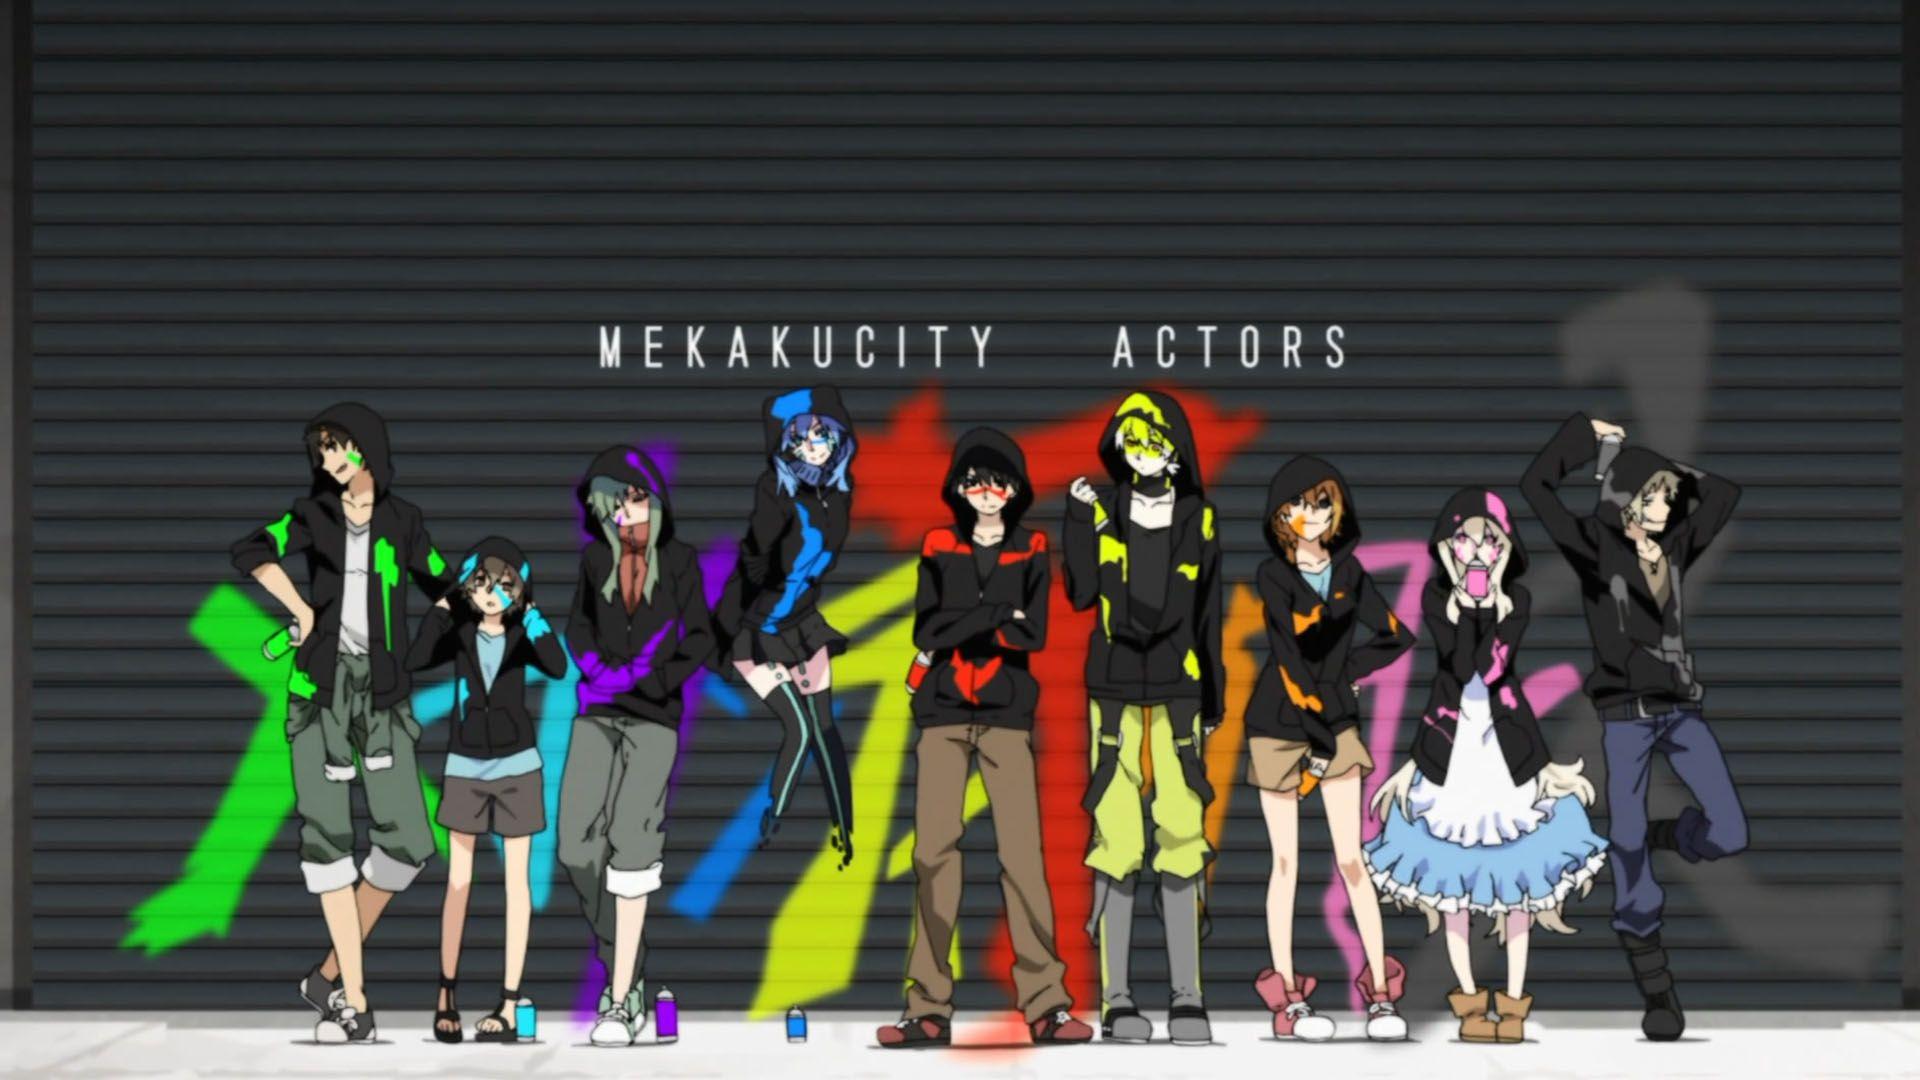 Mekakucity Actors Kagerou Project Actors Anime